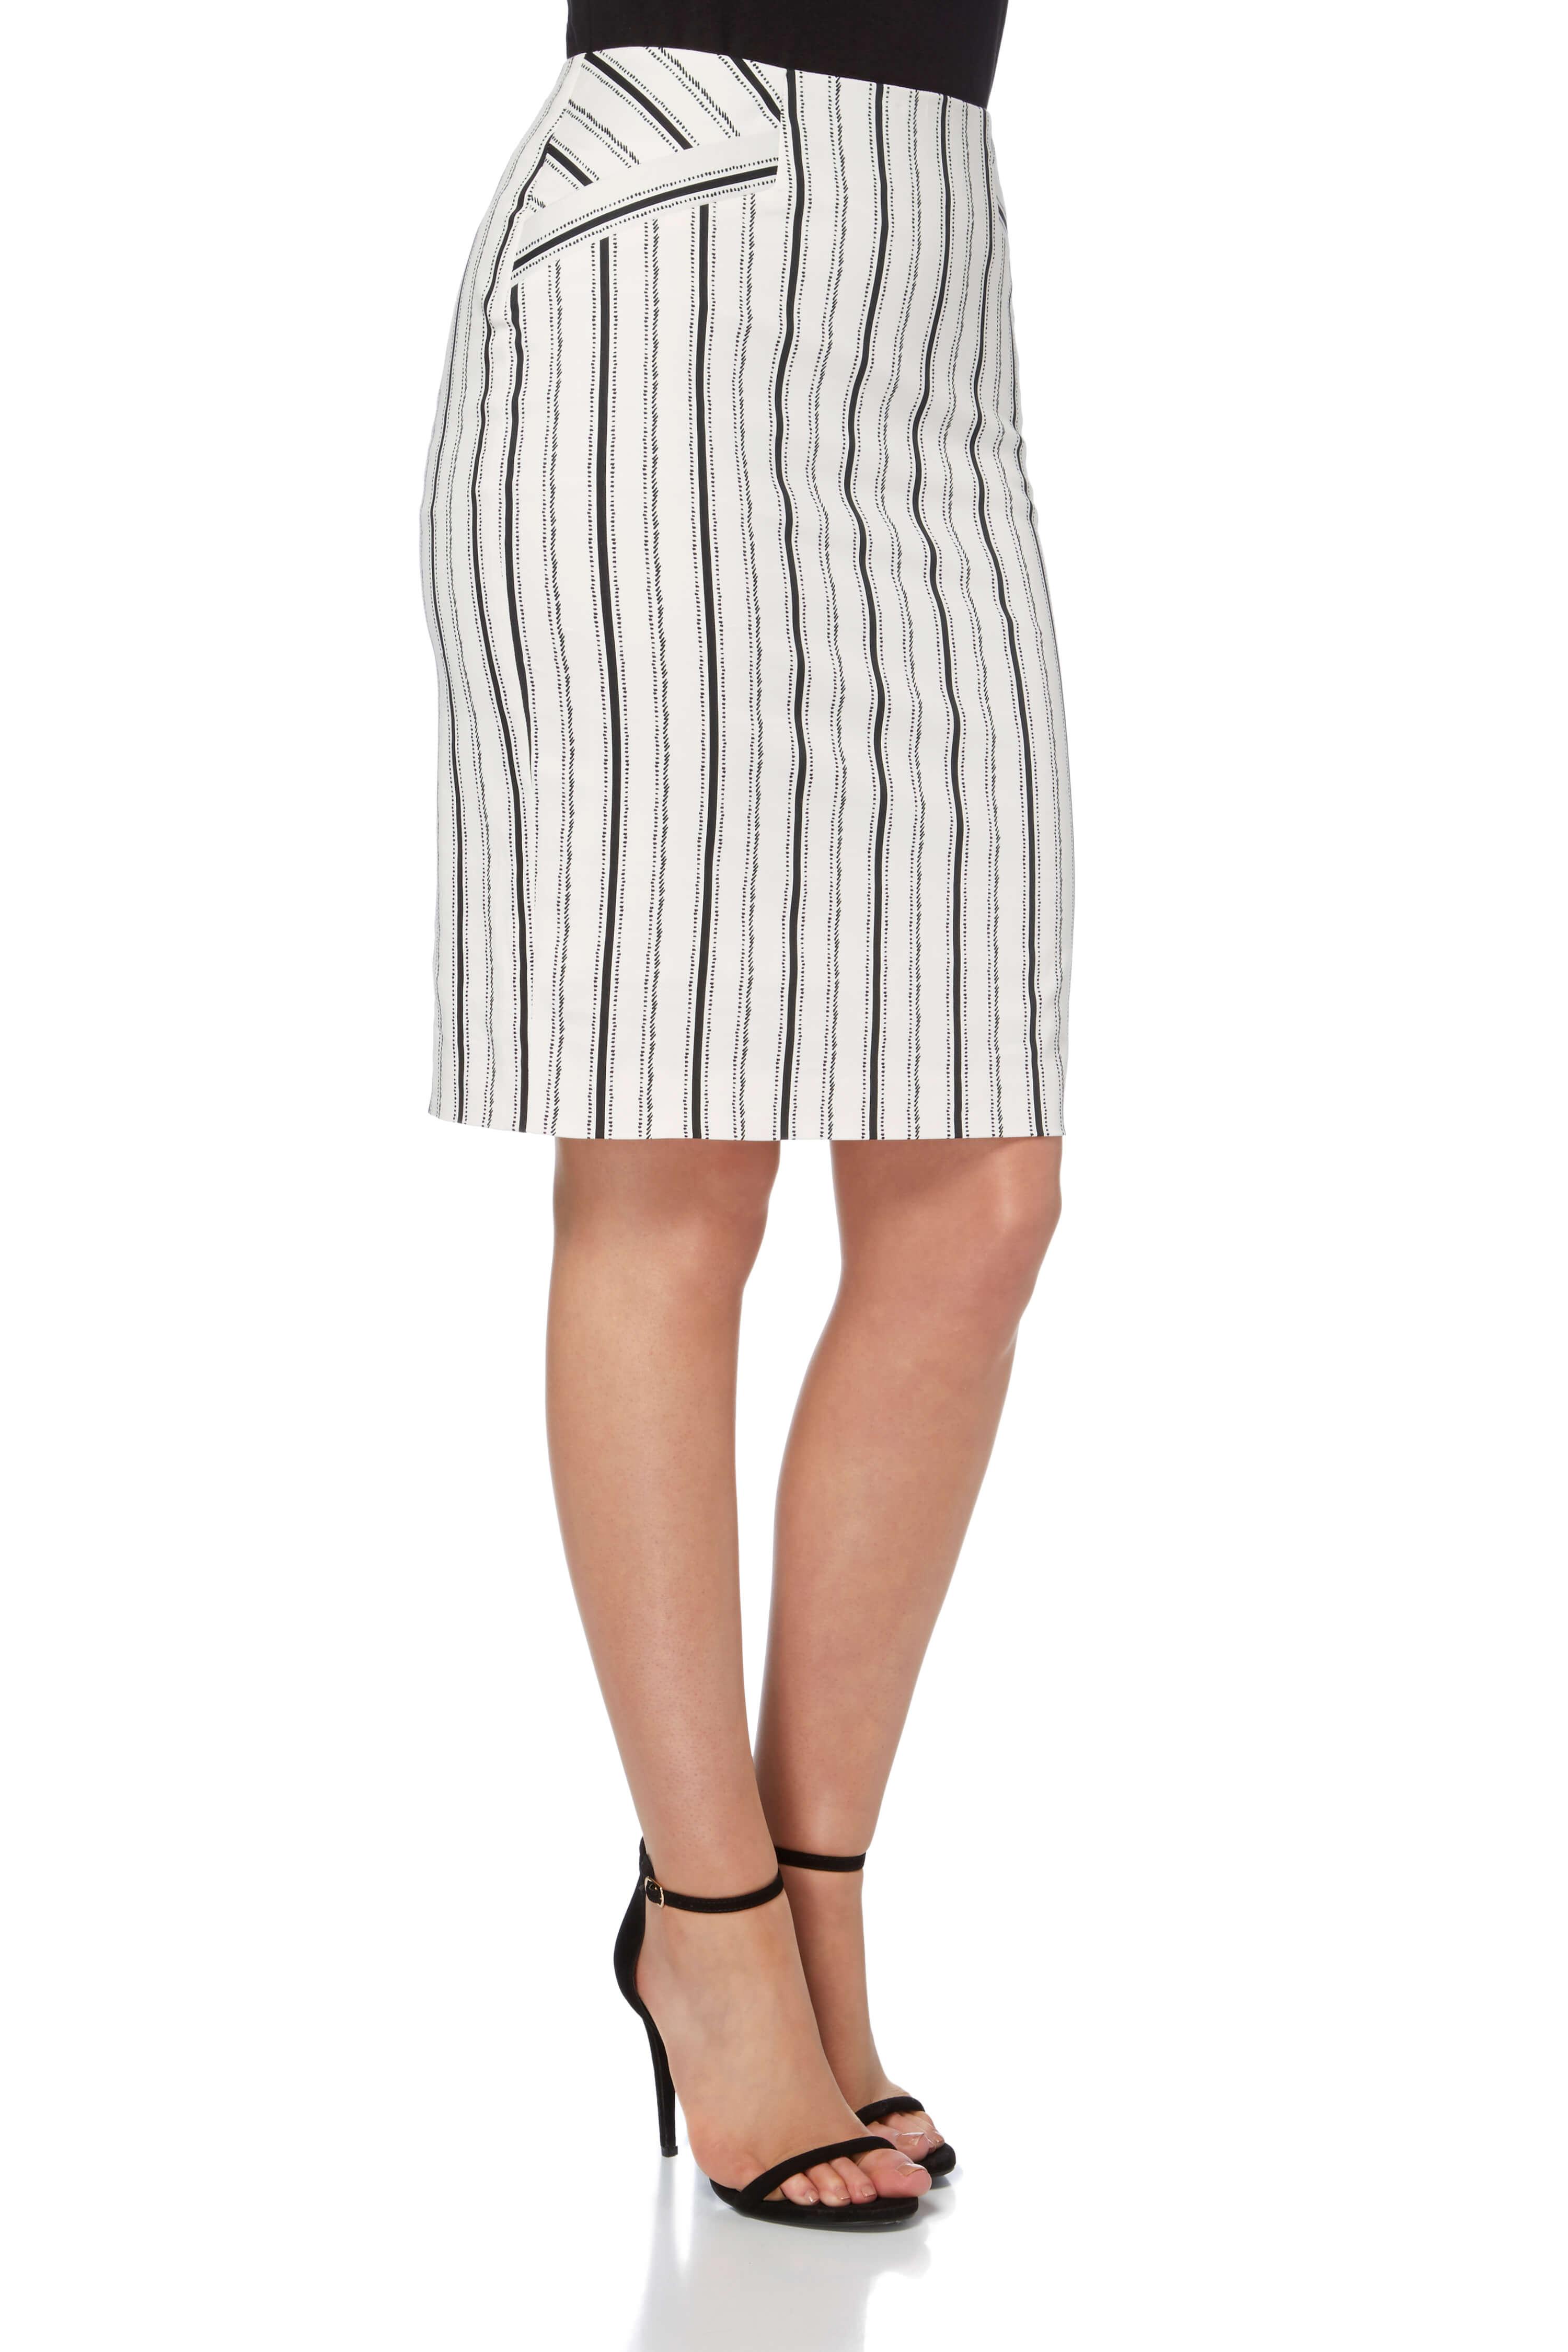 Roman Originals Ladies Cotton Stripe Pencil Skirt Ivory